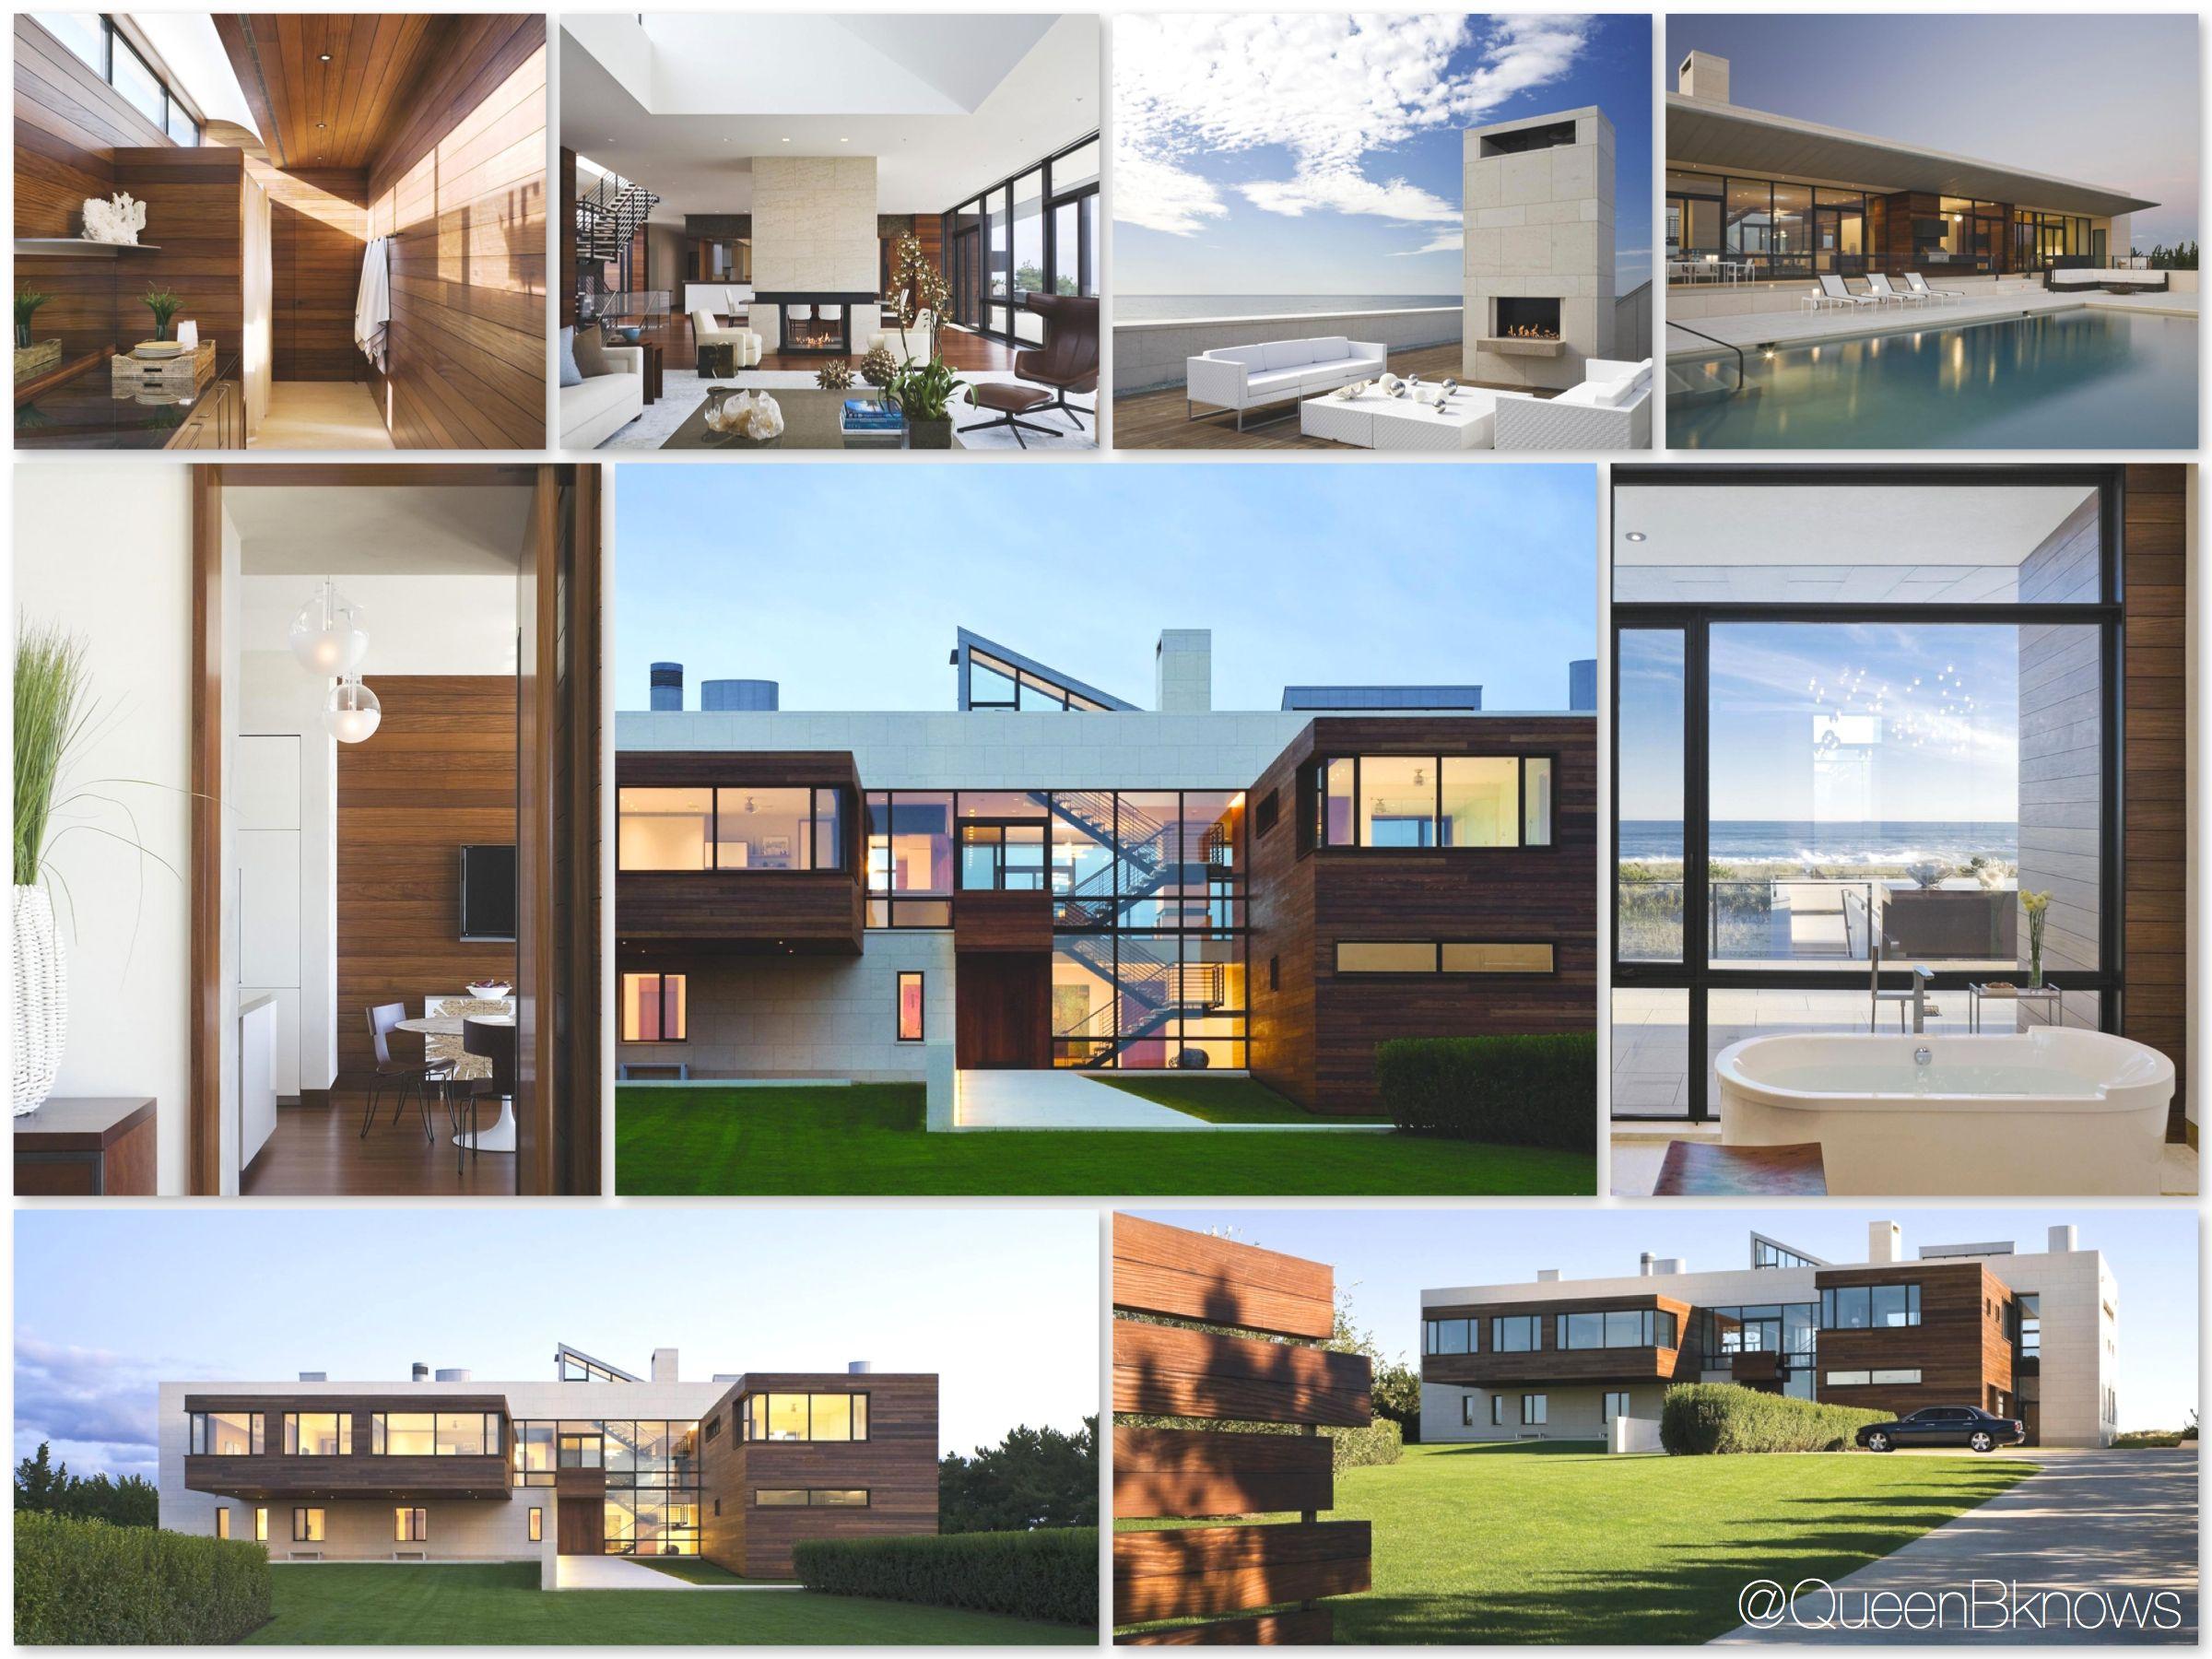 SOUTHAMPTON BEACH HOUSE BY ALEXANDER GORLIN ARCHITECTS